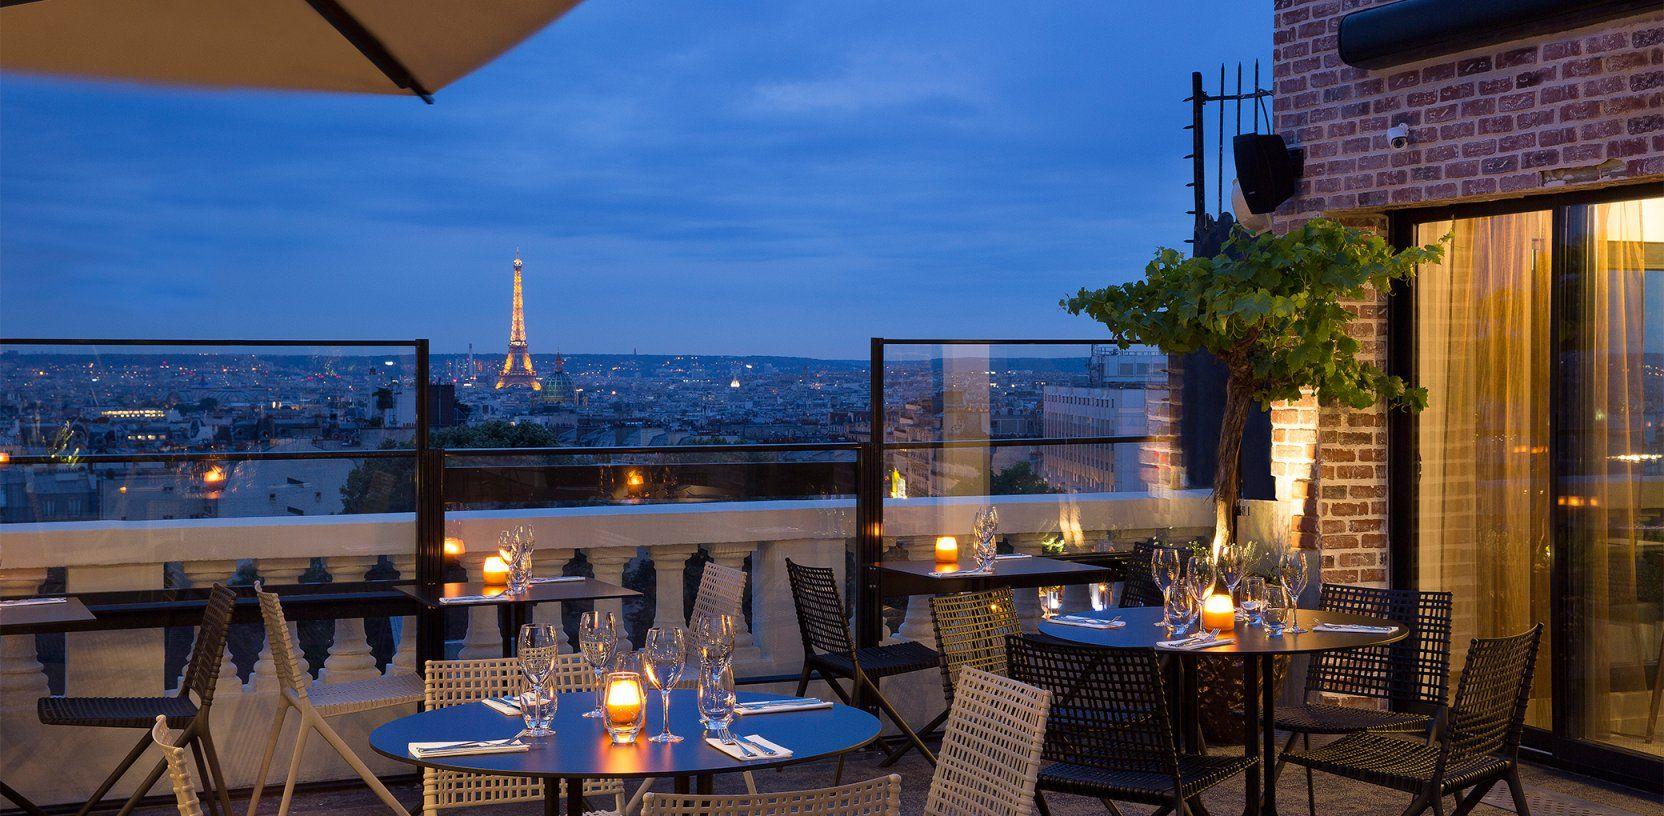 12-14 rue Joseph de Maistre 75018 Paris | resto Paris | Pinterest